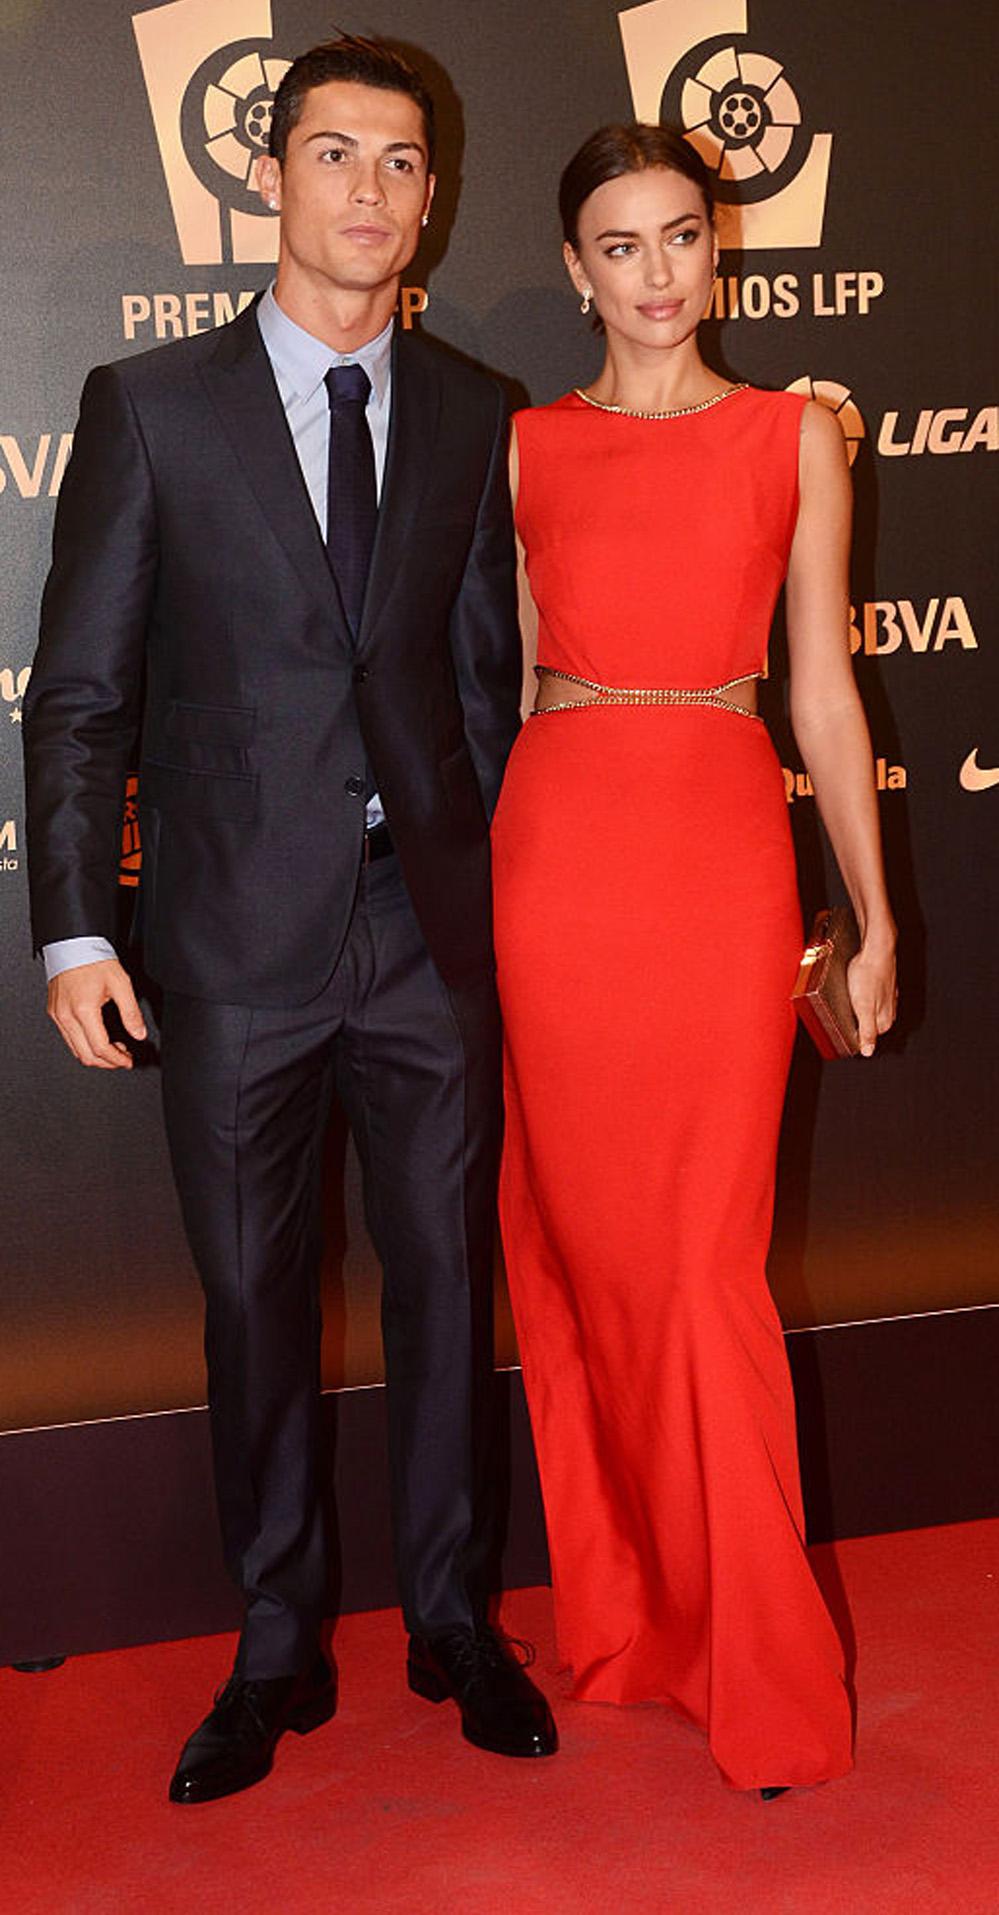 Irina Shayk og Cristiano Ronaldo (Europa Press/Getty)